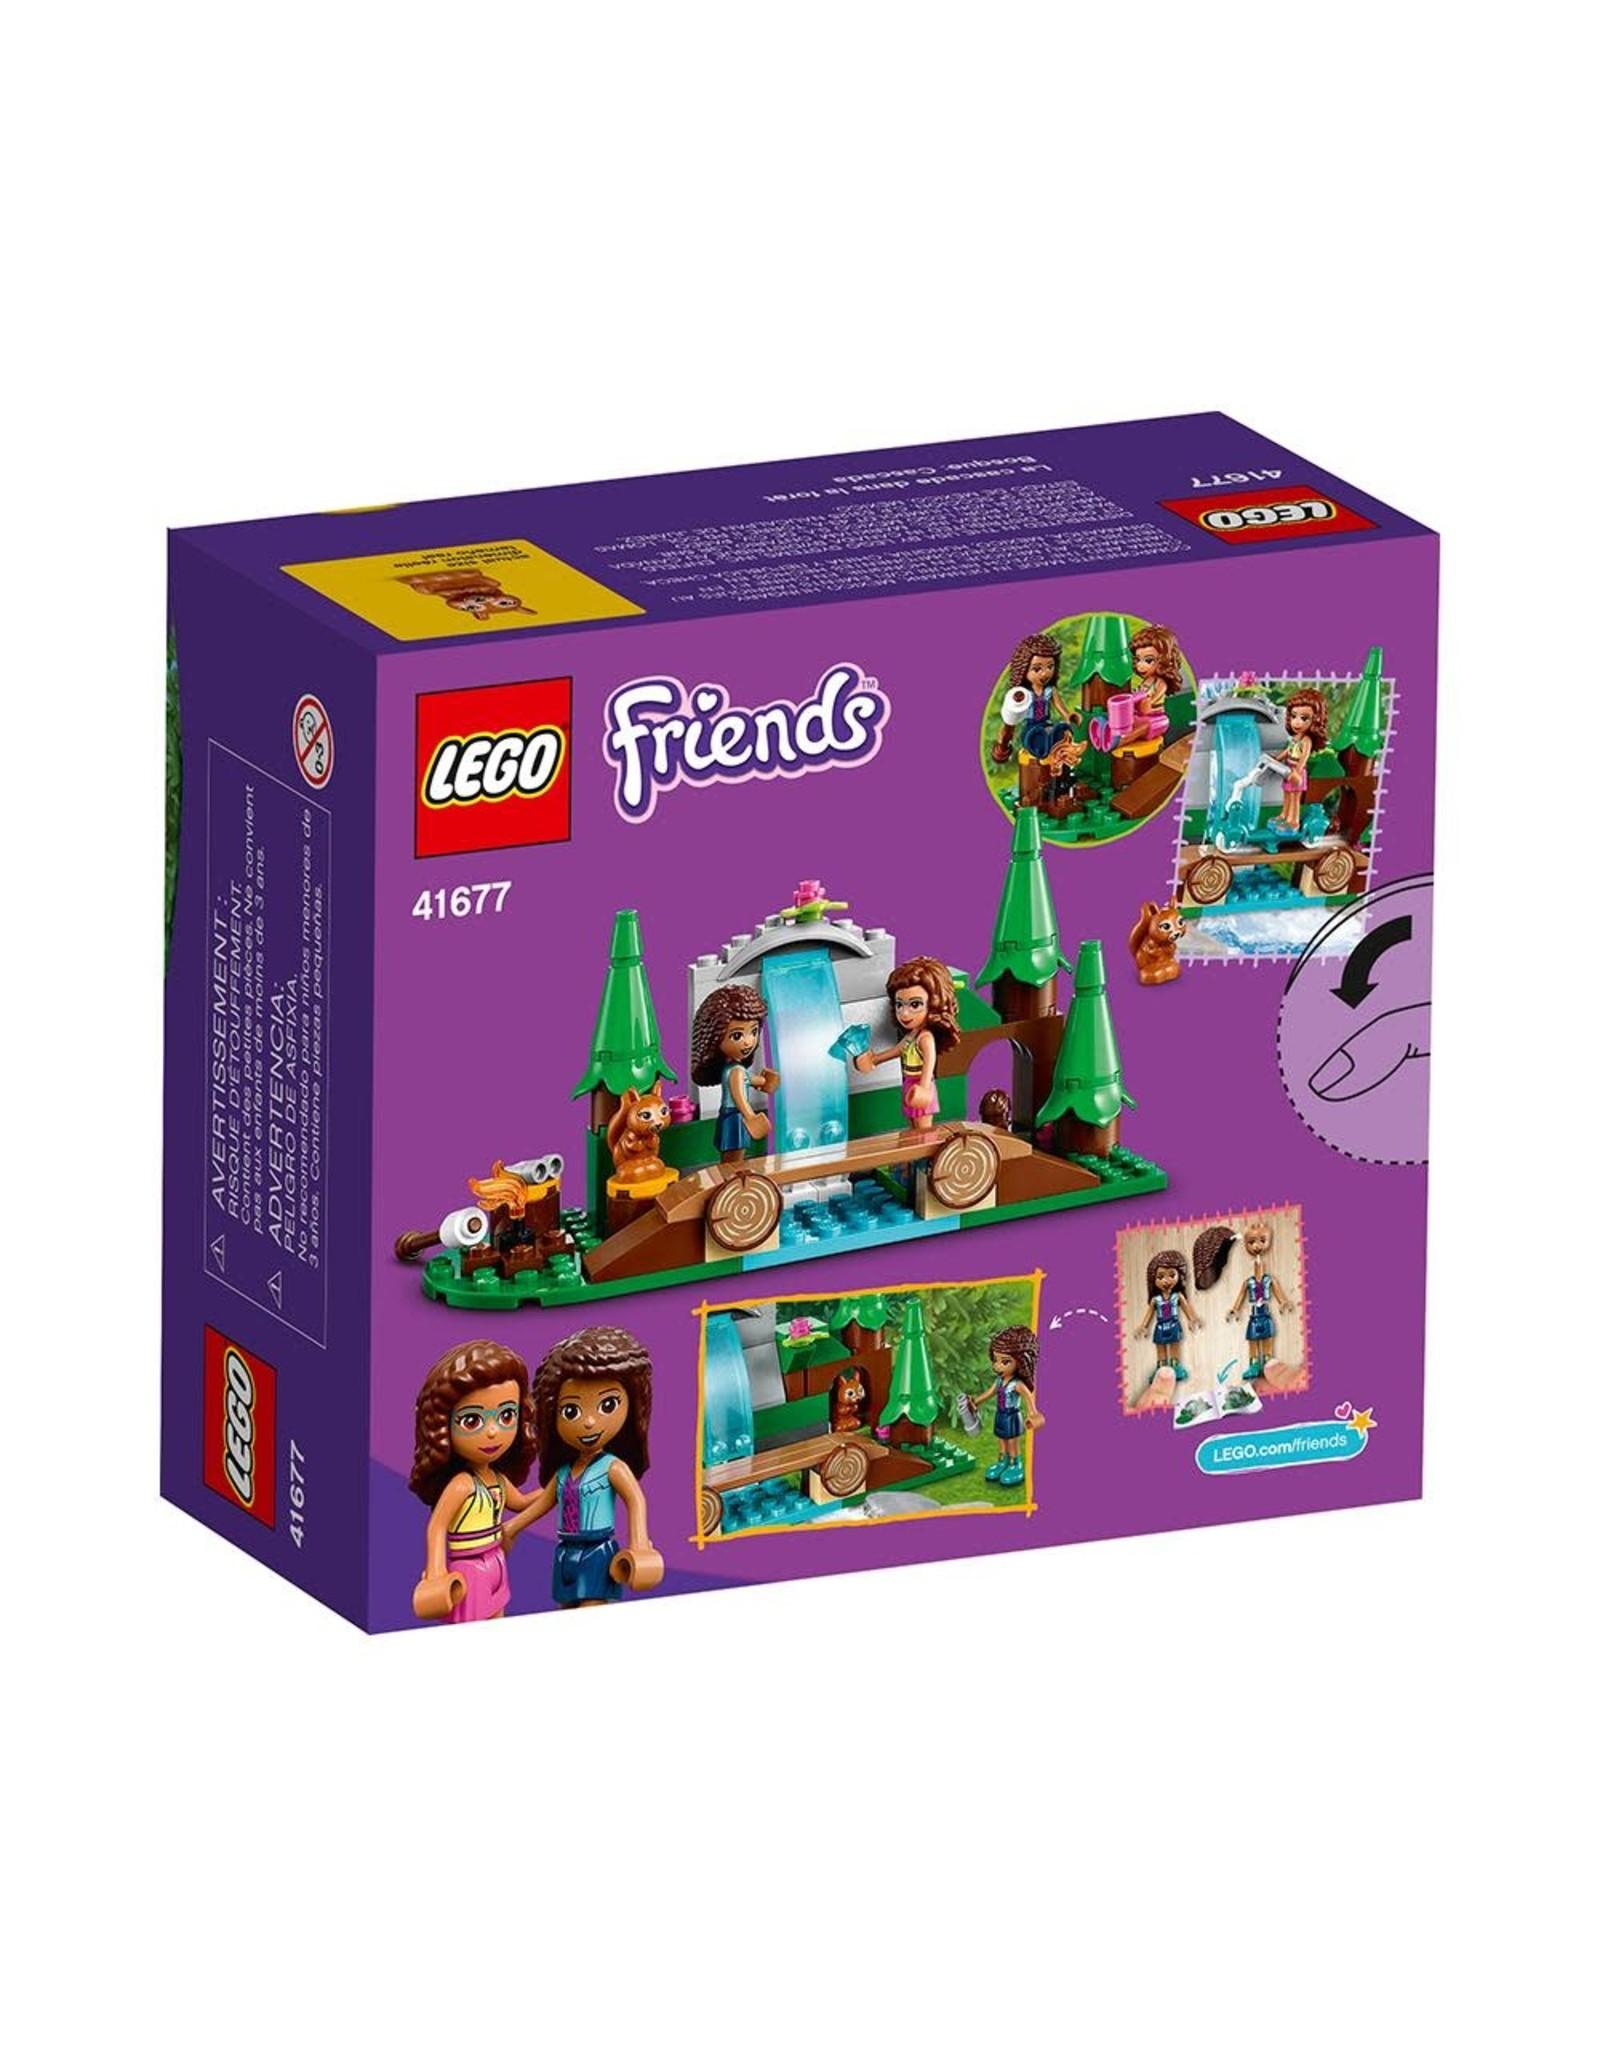 LEGO Friends  41677 Forest Waterfall